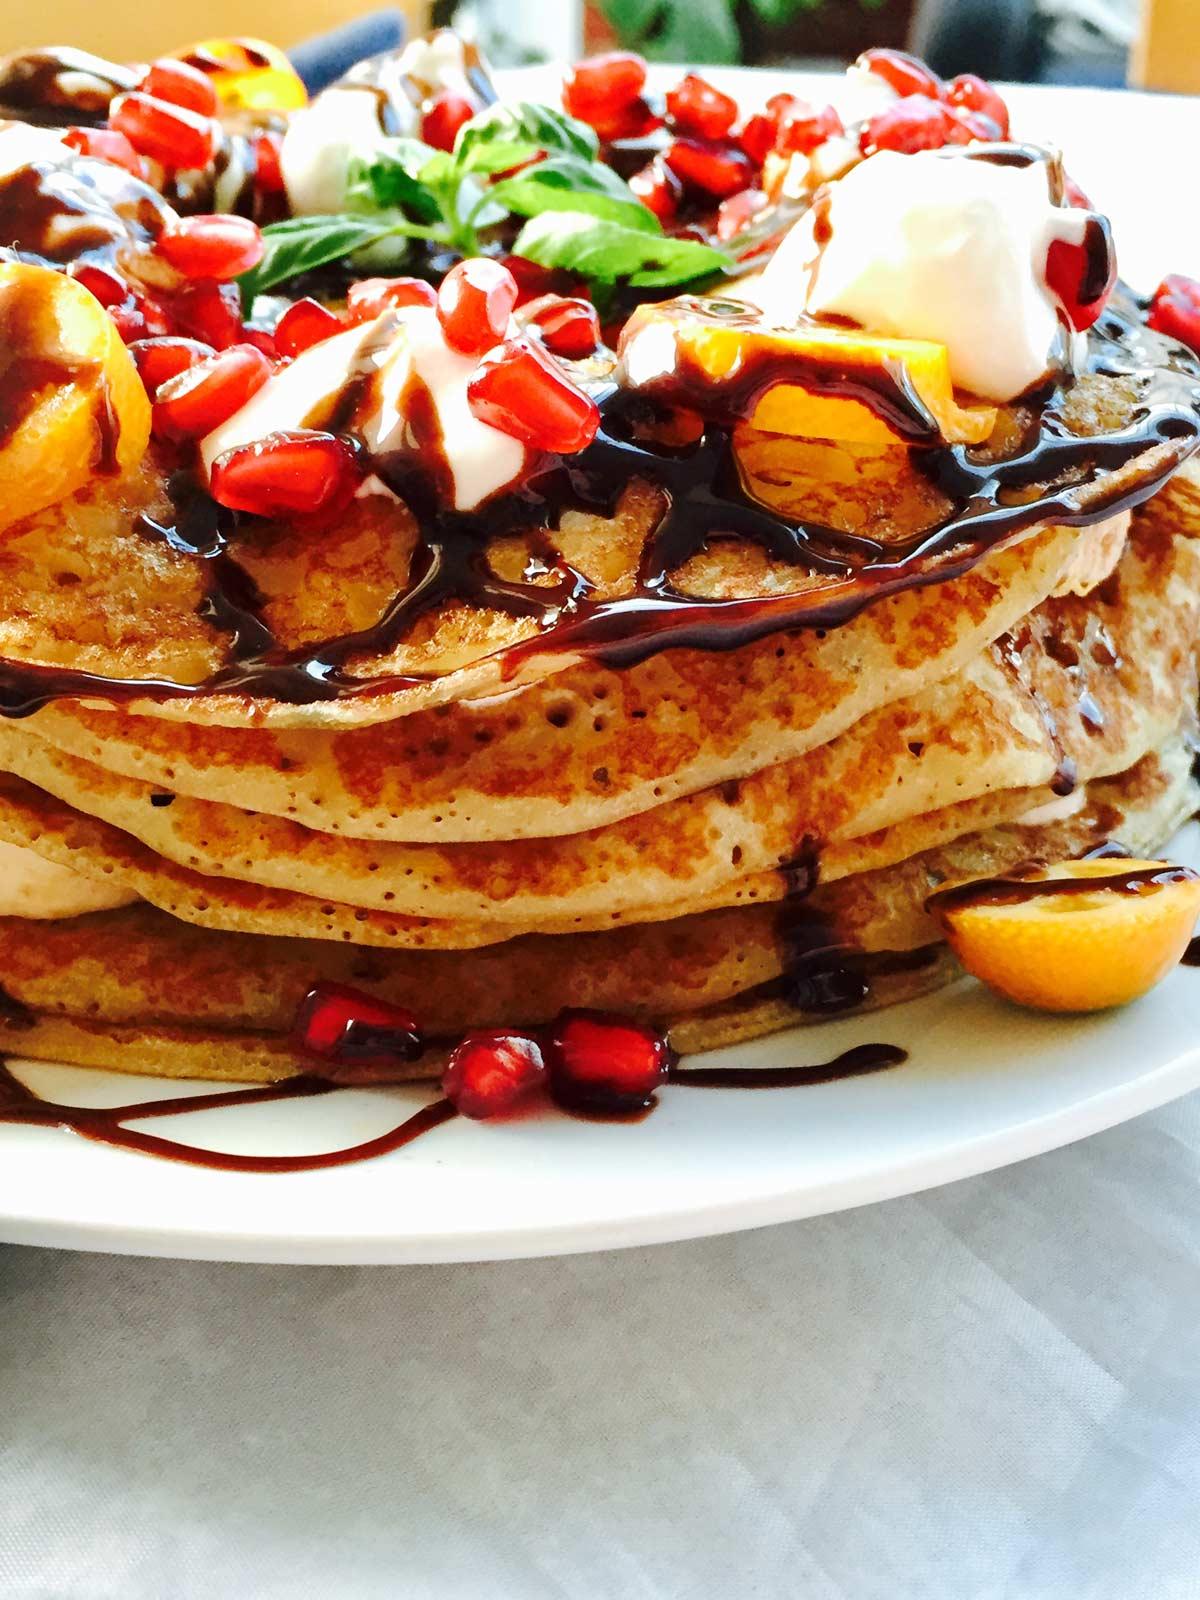 Tutti frutti fluffy pancake cake with fruits